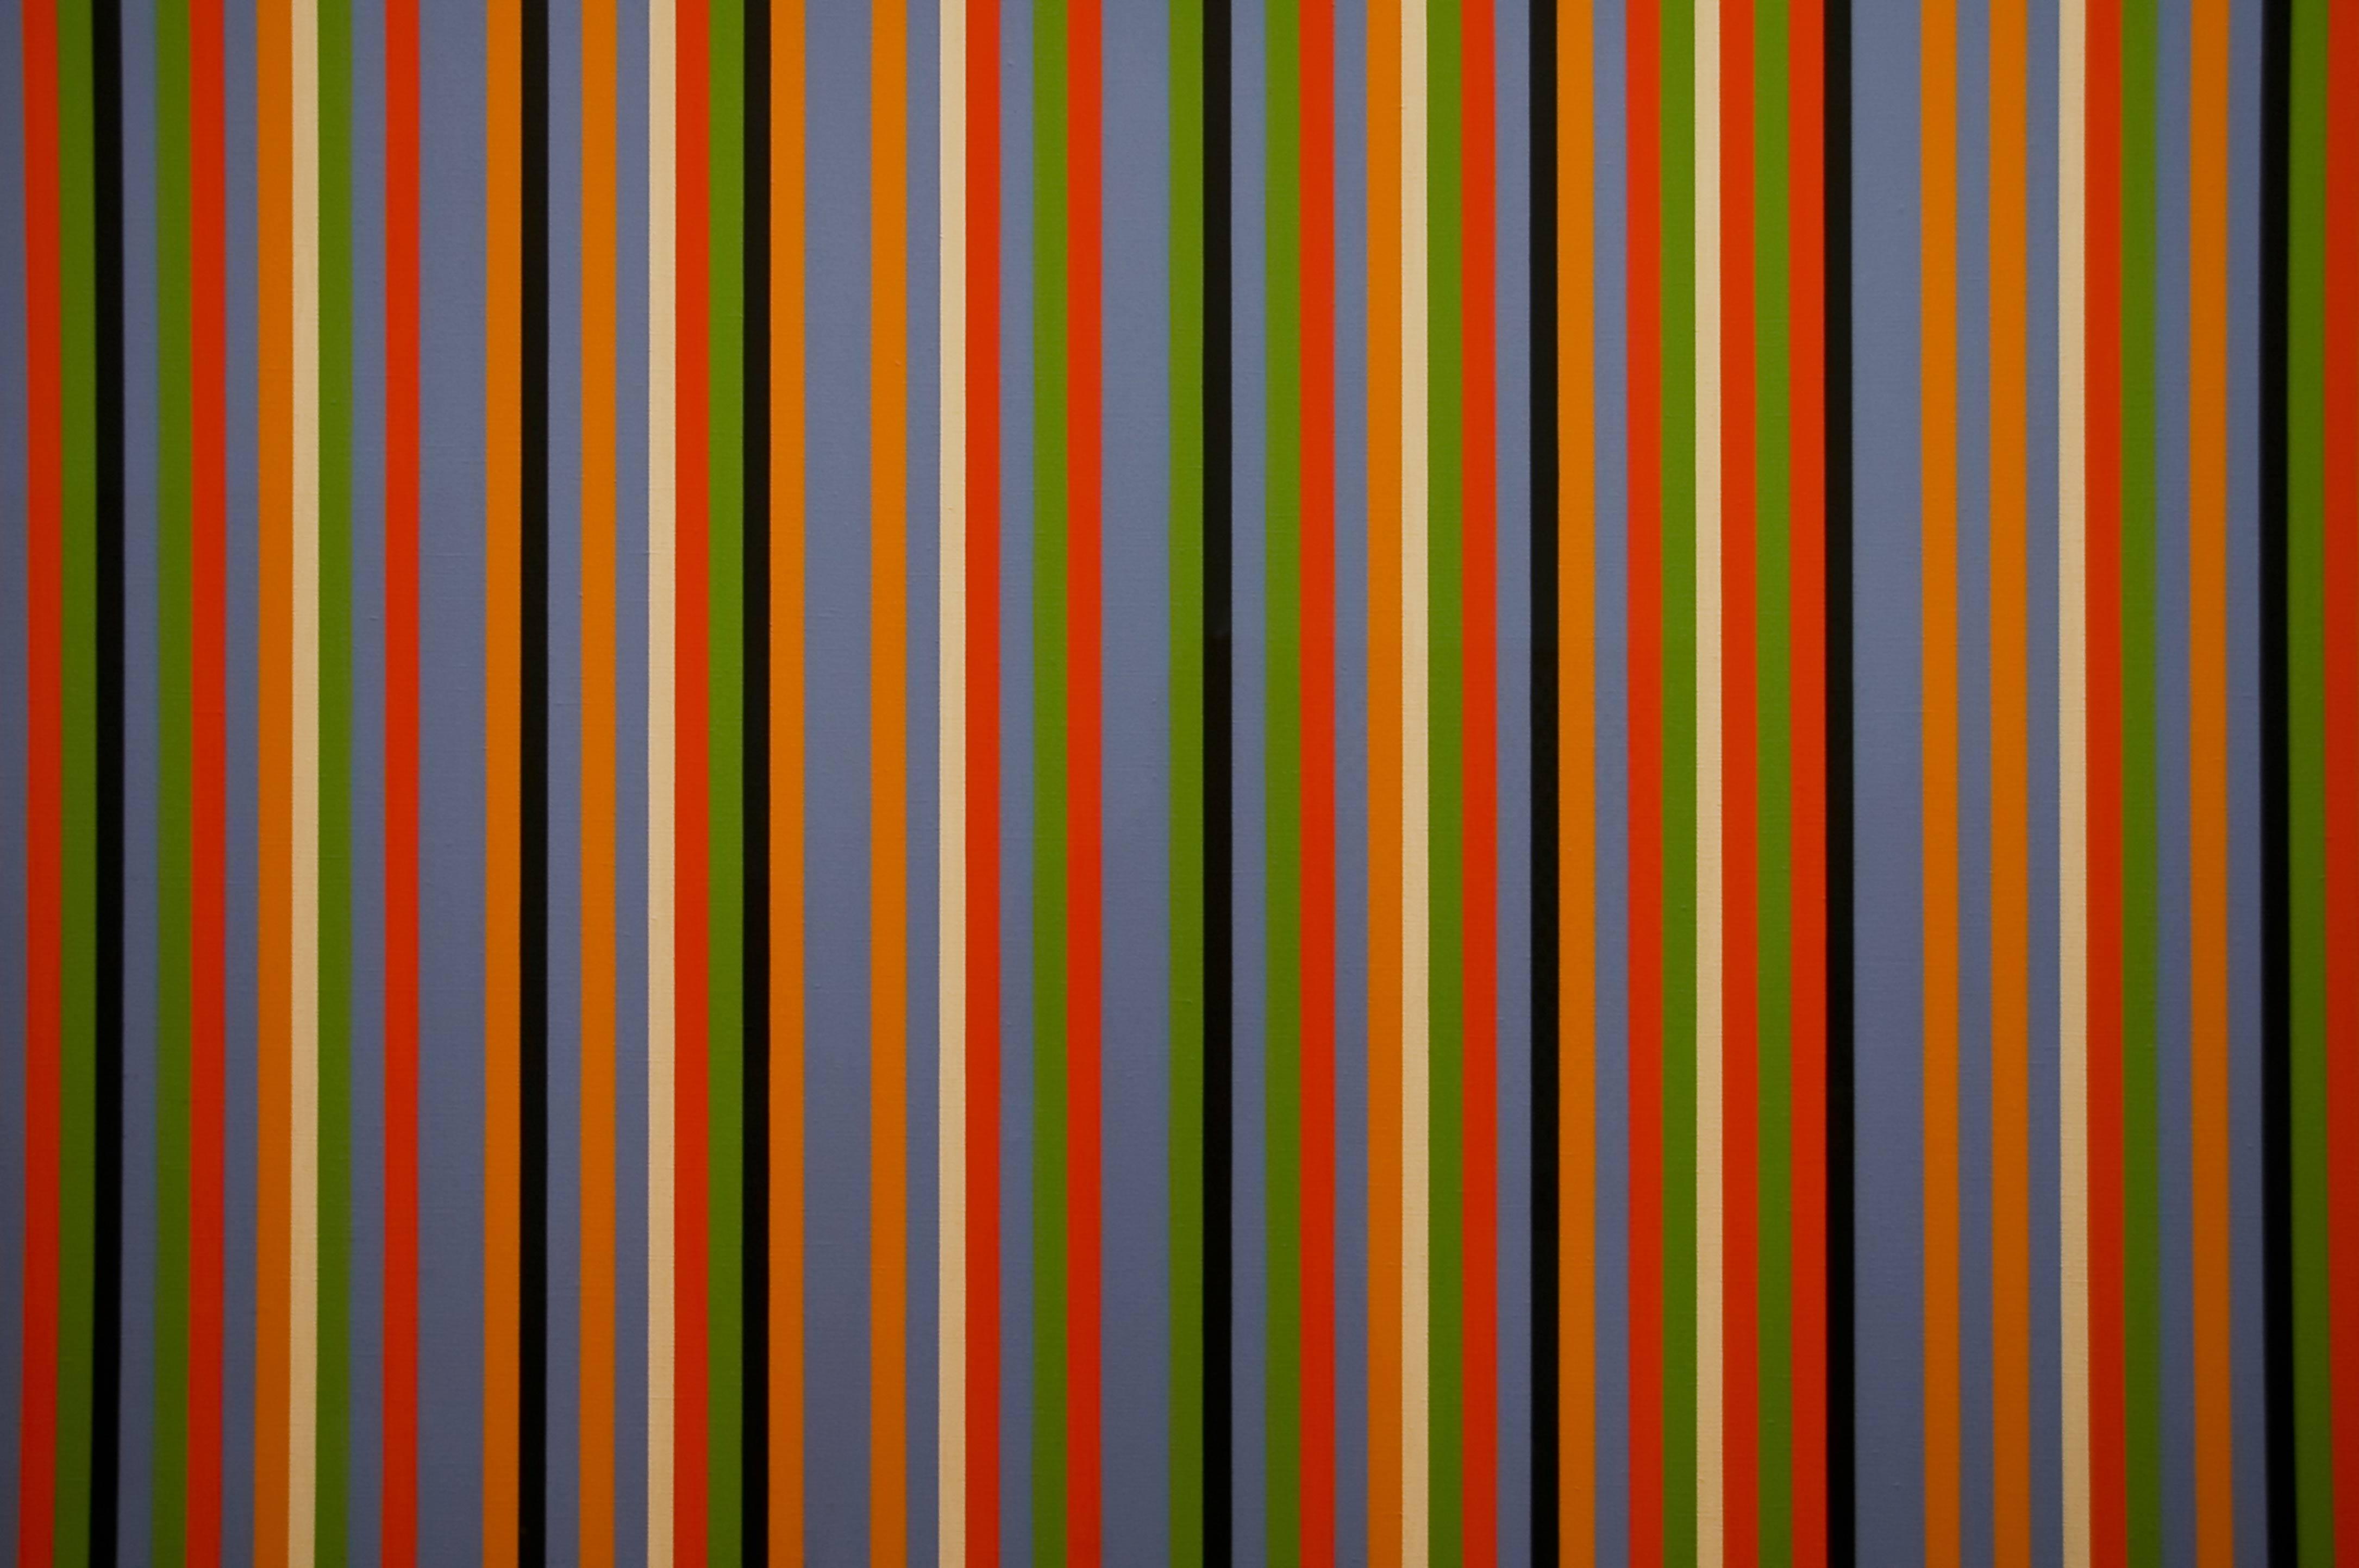 Vertical Colourfull thin Stripes Wallpaper